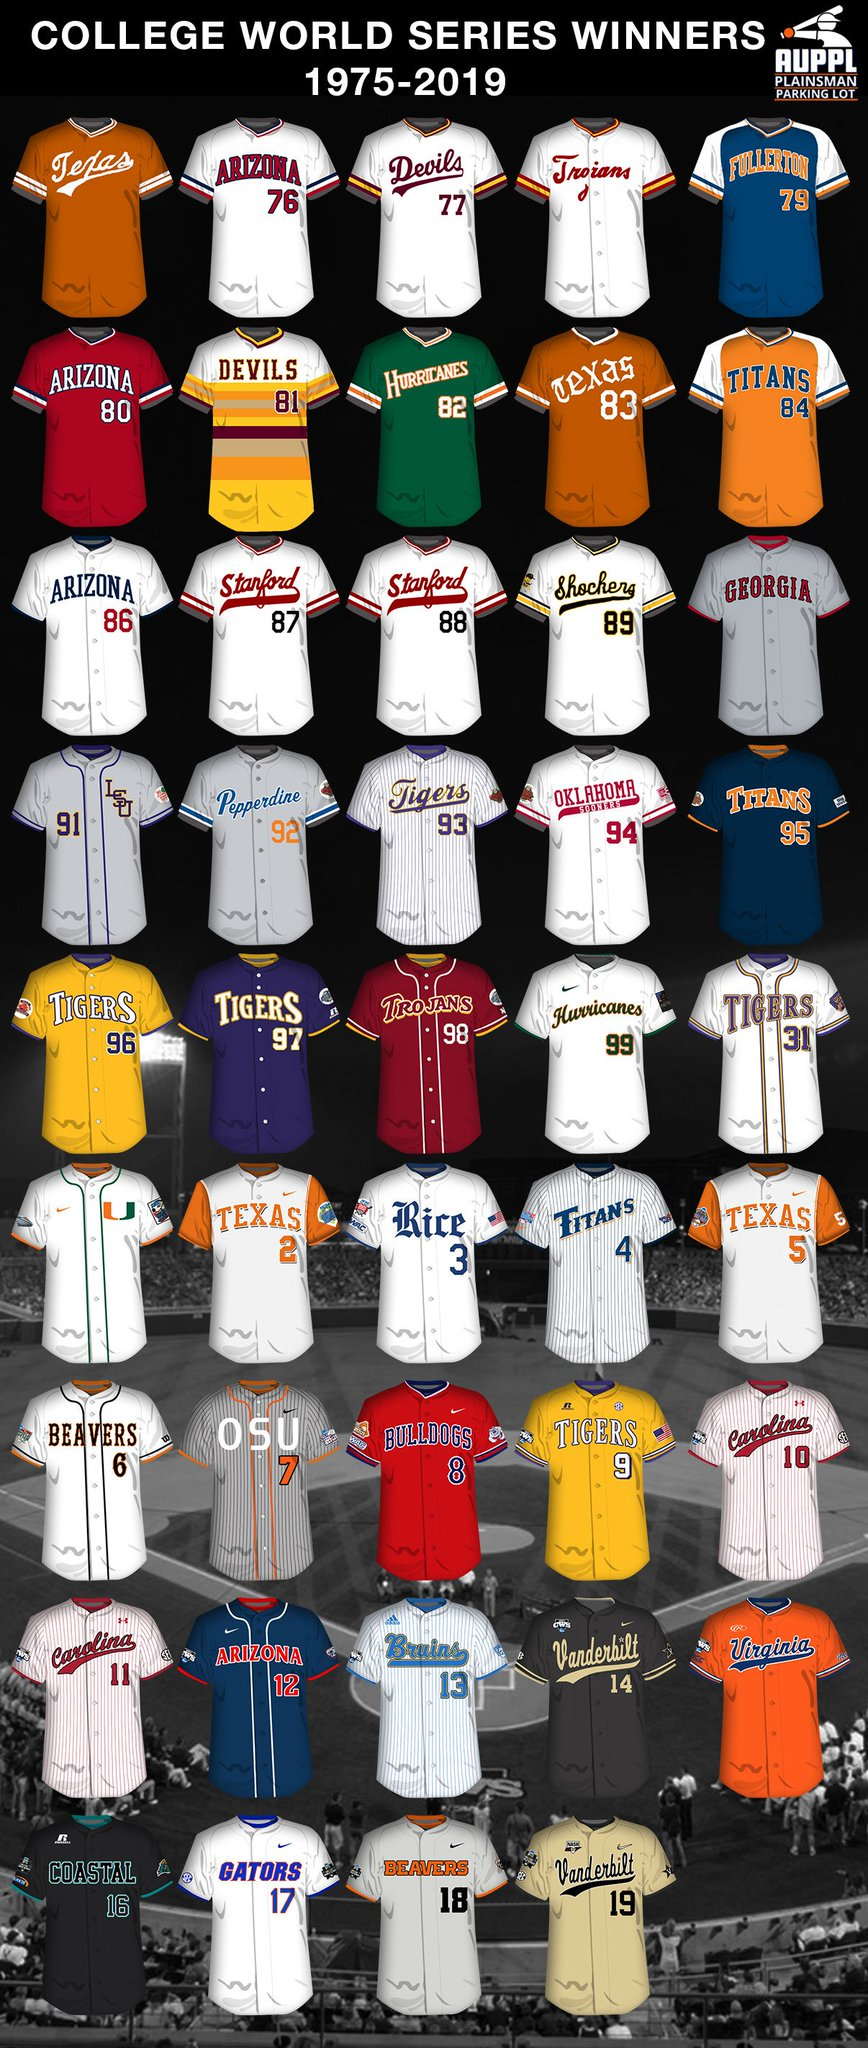 The College World Series Winning Uniforms:  1975-2019 https://t.co/arKC7Rvxrr